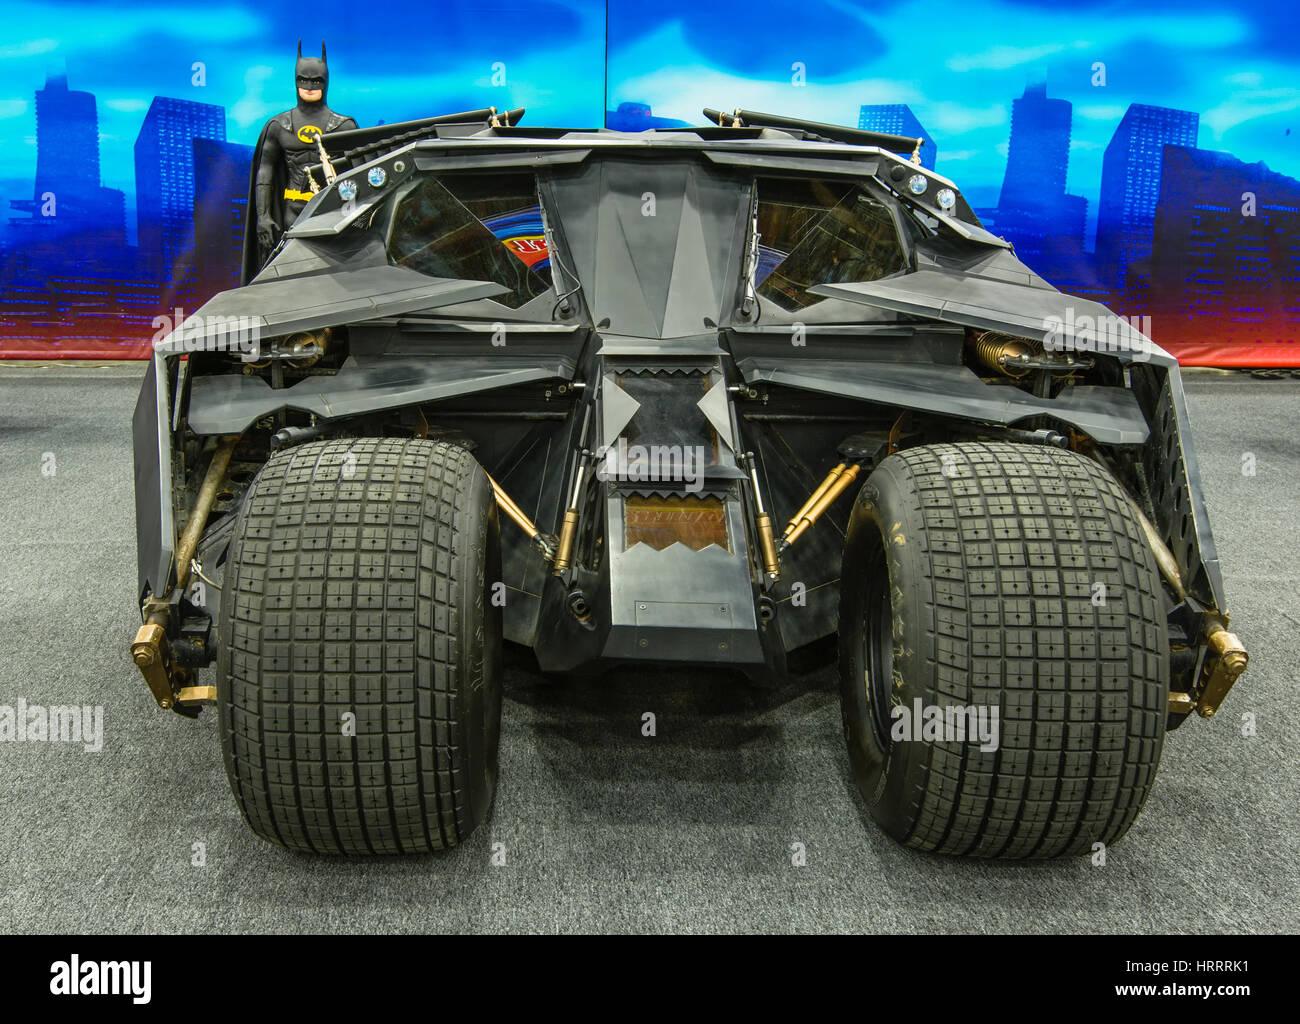 DETROIT, MI - 8 de marzo: Batman y el 2005 General Motors 'Jet Engine' Batimóvil de 'Batman Begins' Imagen De Stock